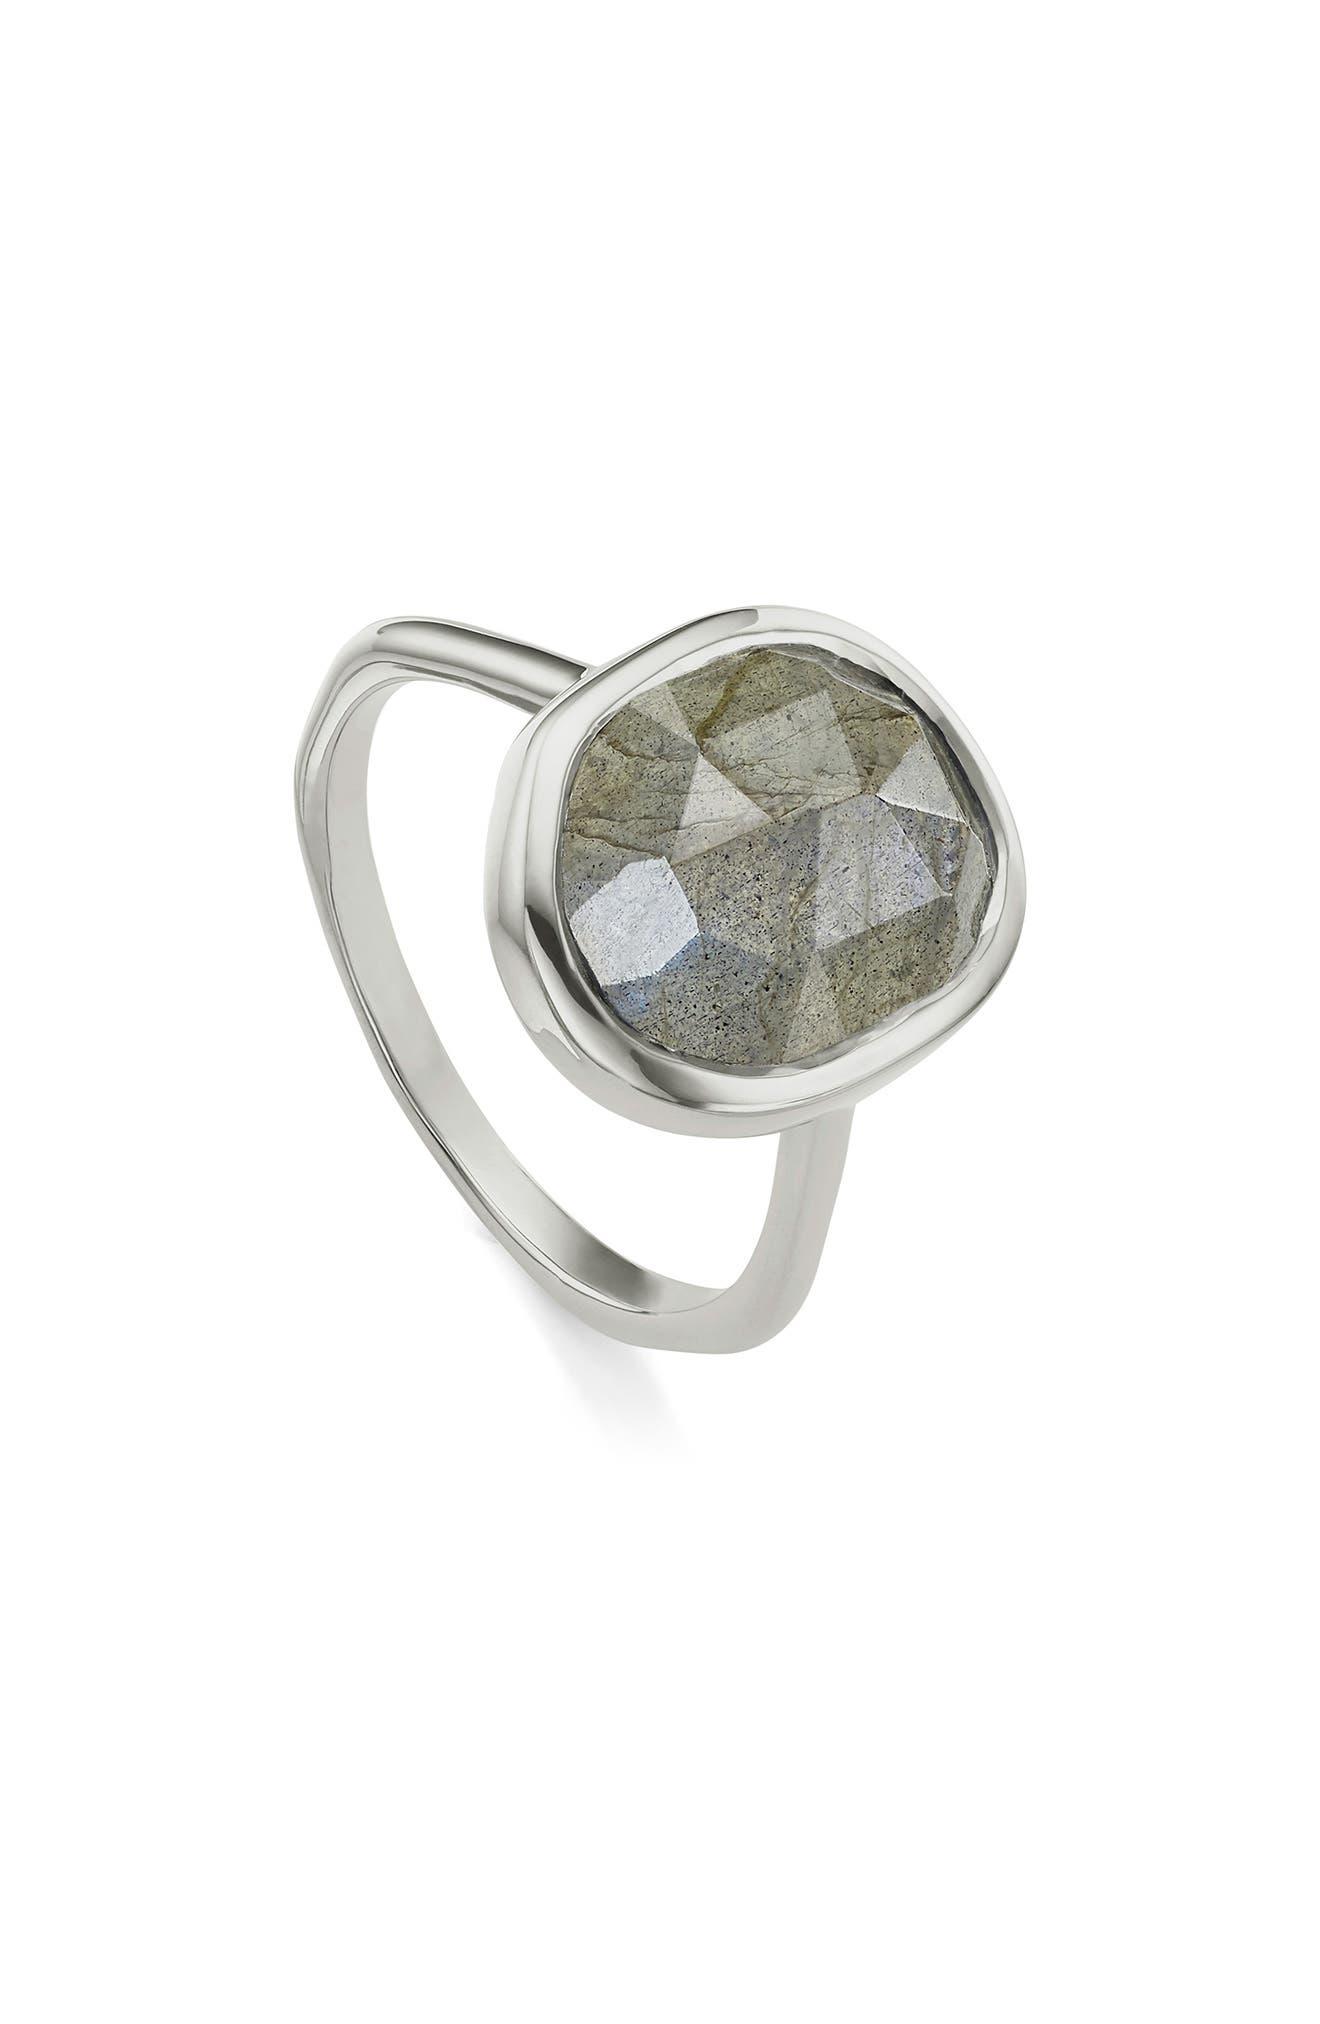 'Siren' Medium Semiprecious Stone Stacking Ring,                             Main thumbnail 1, color,                             SILVER/ LABRADORITE